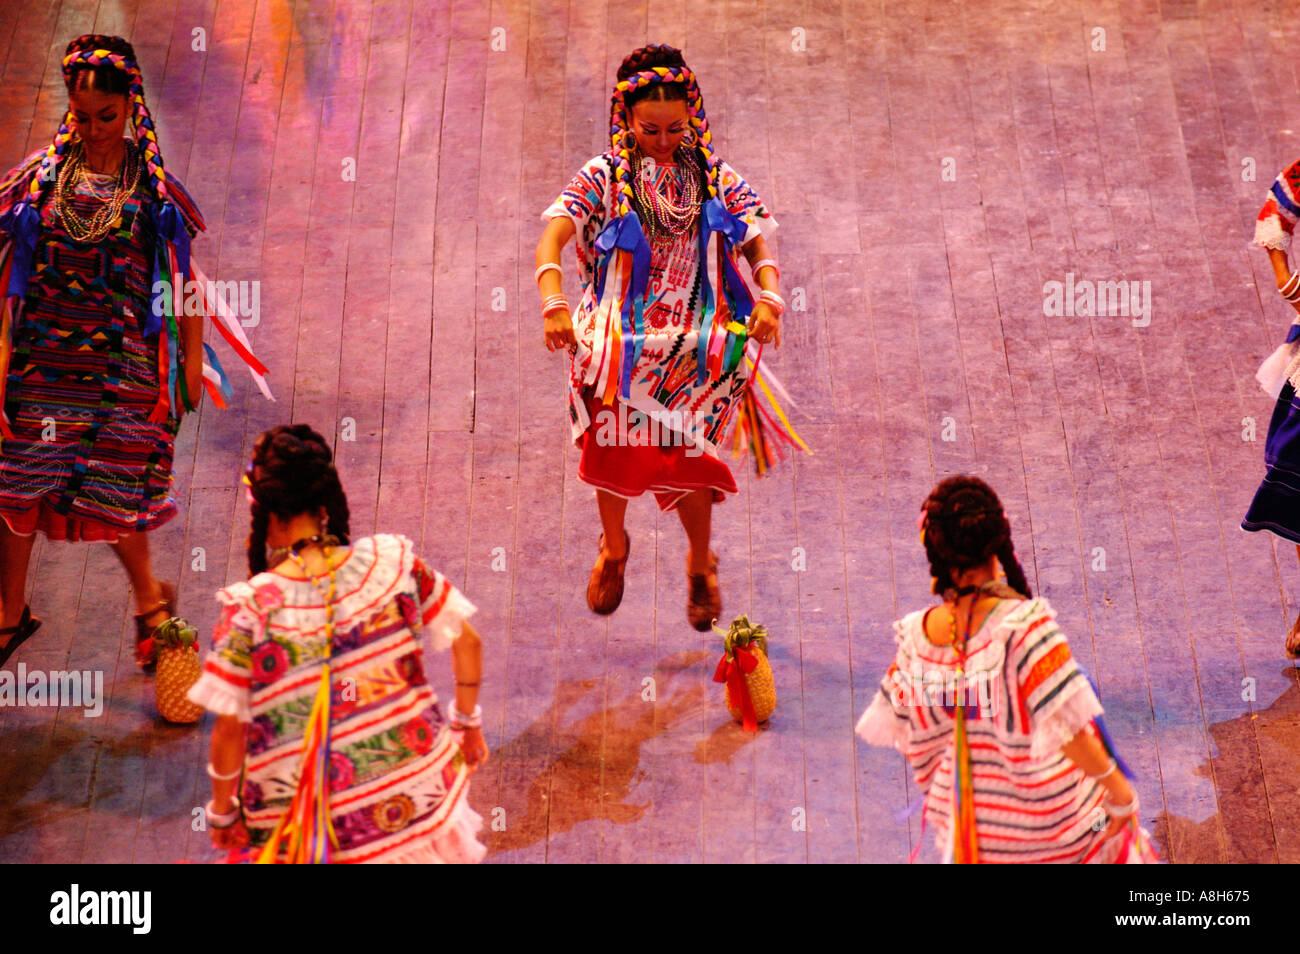 Mexico, Riviera Maya, Xcaret, Folkloric show - Stock Image